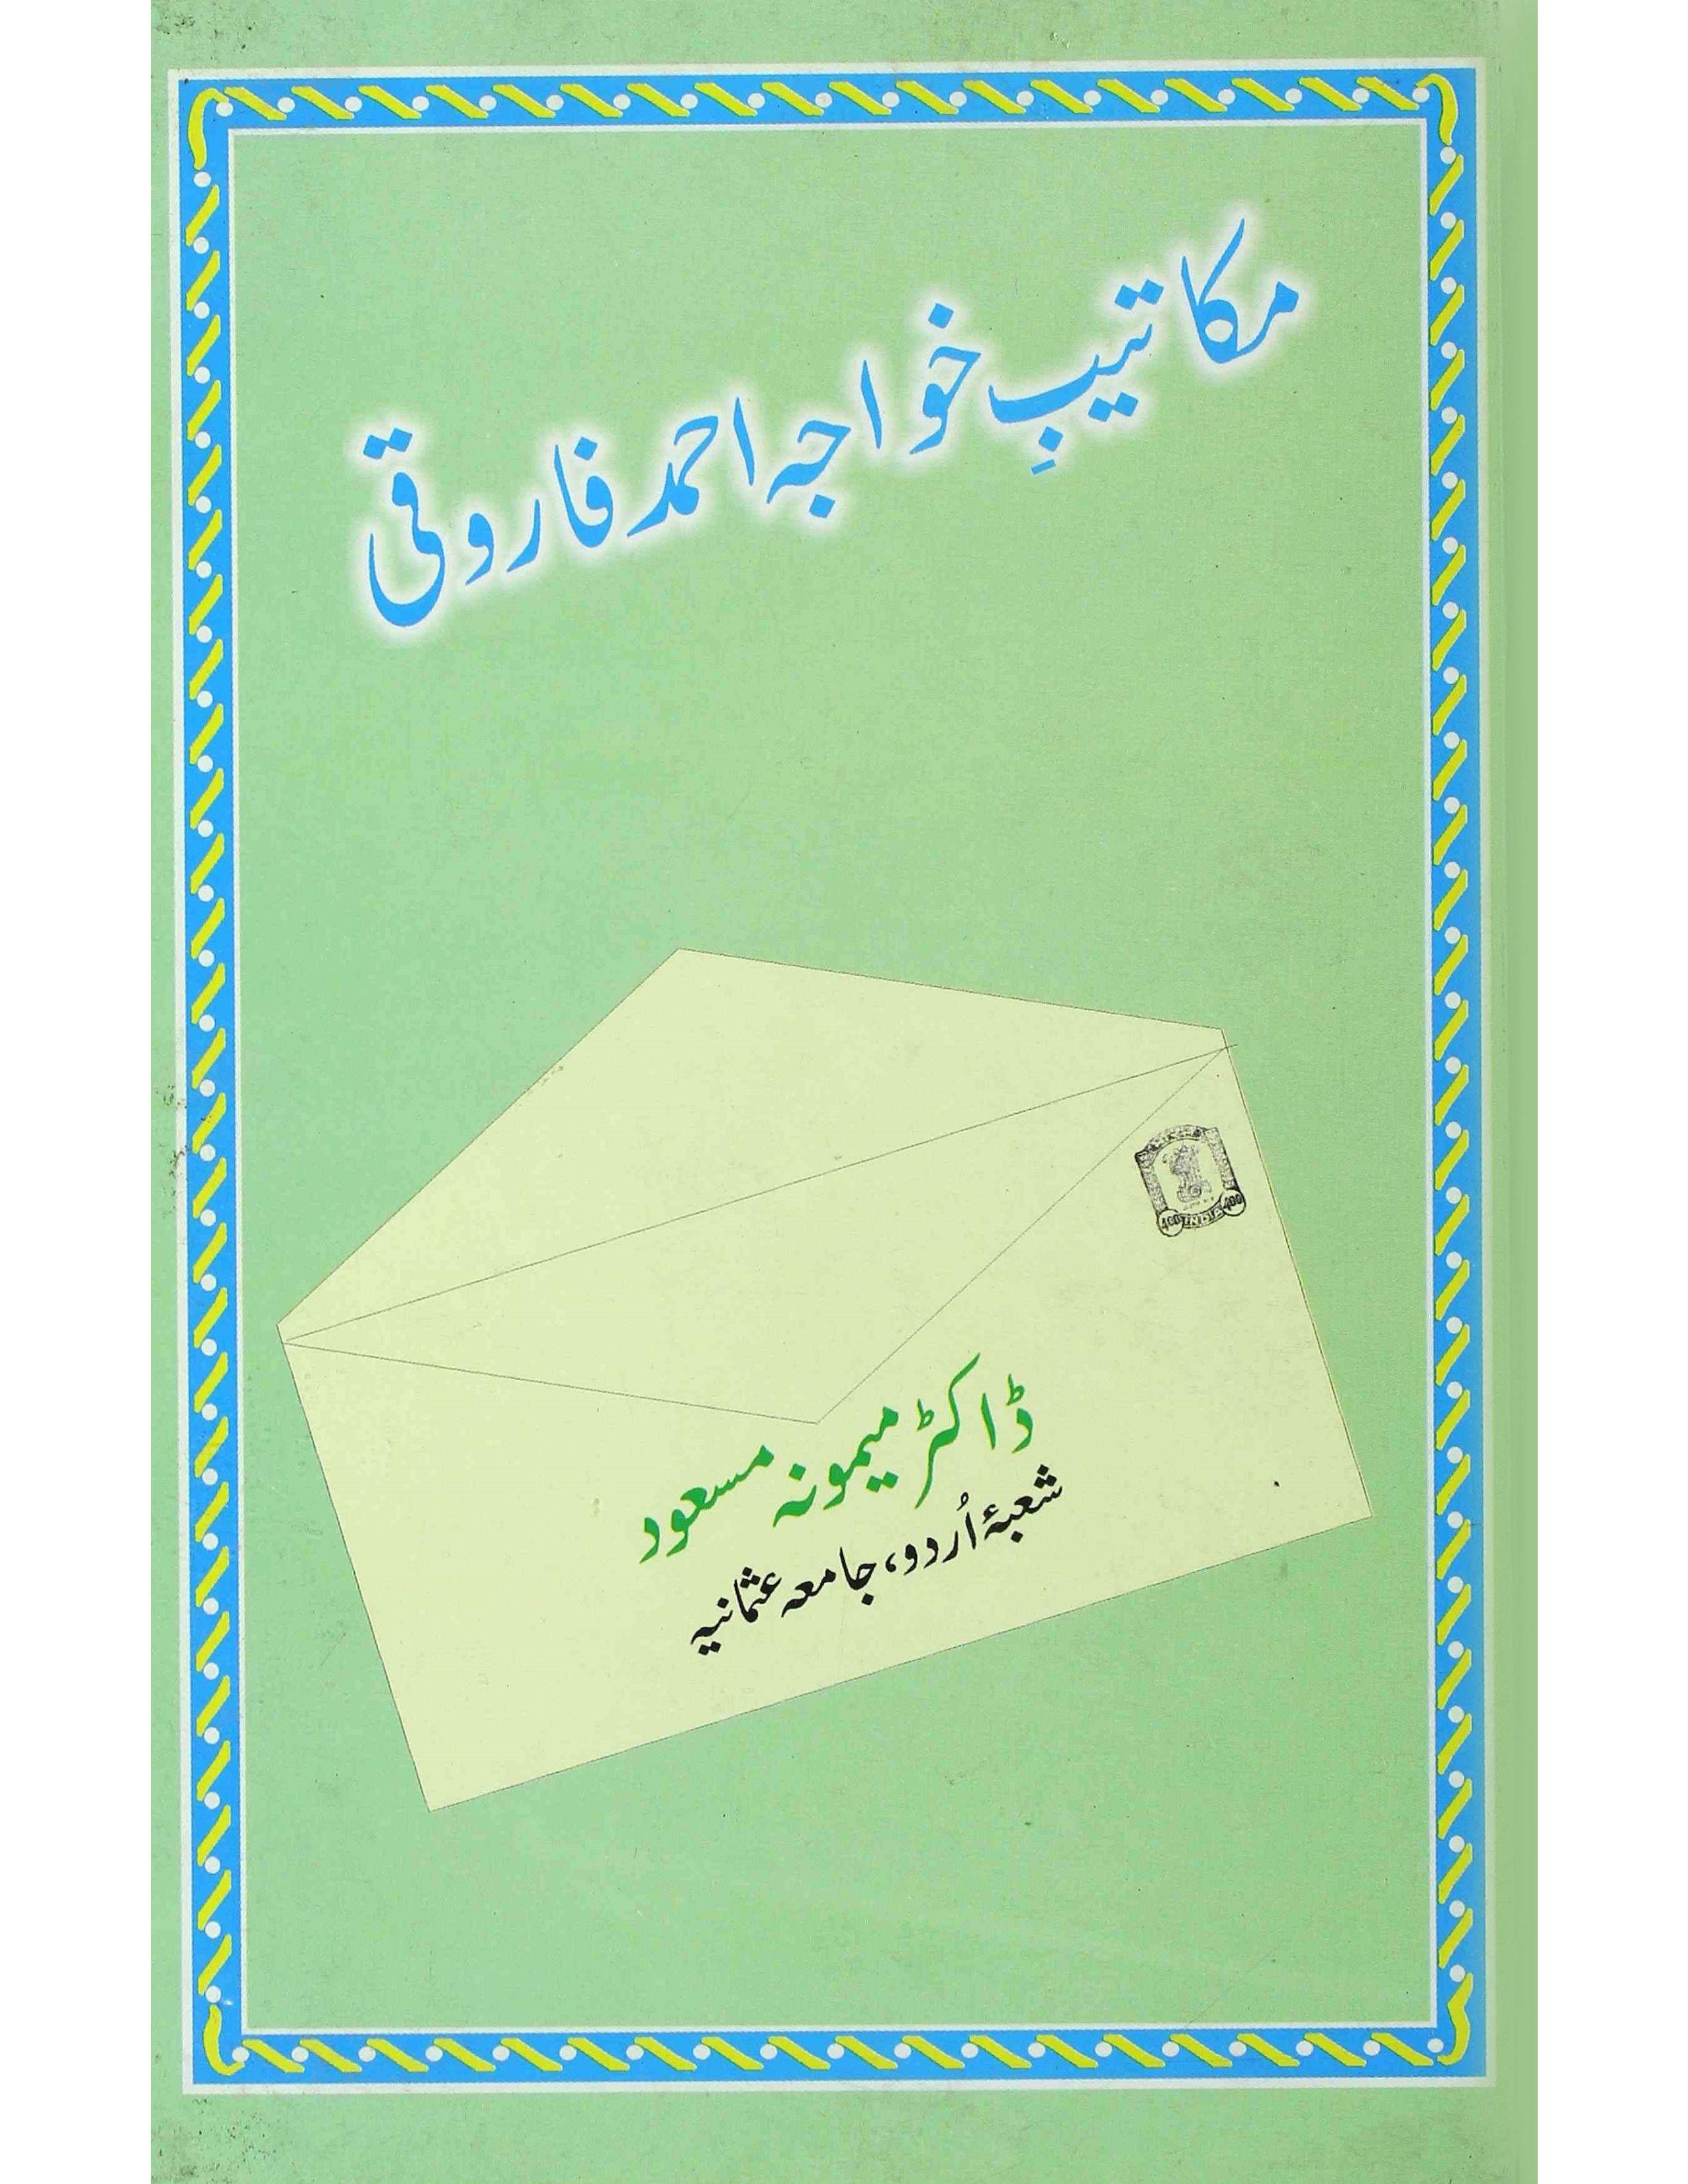 Makateeb-e-Khwaja Ahmad Farooqi